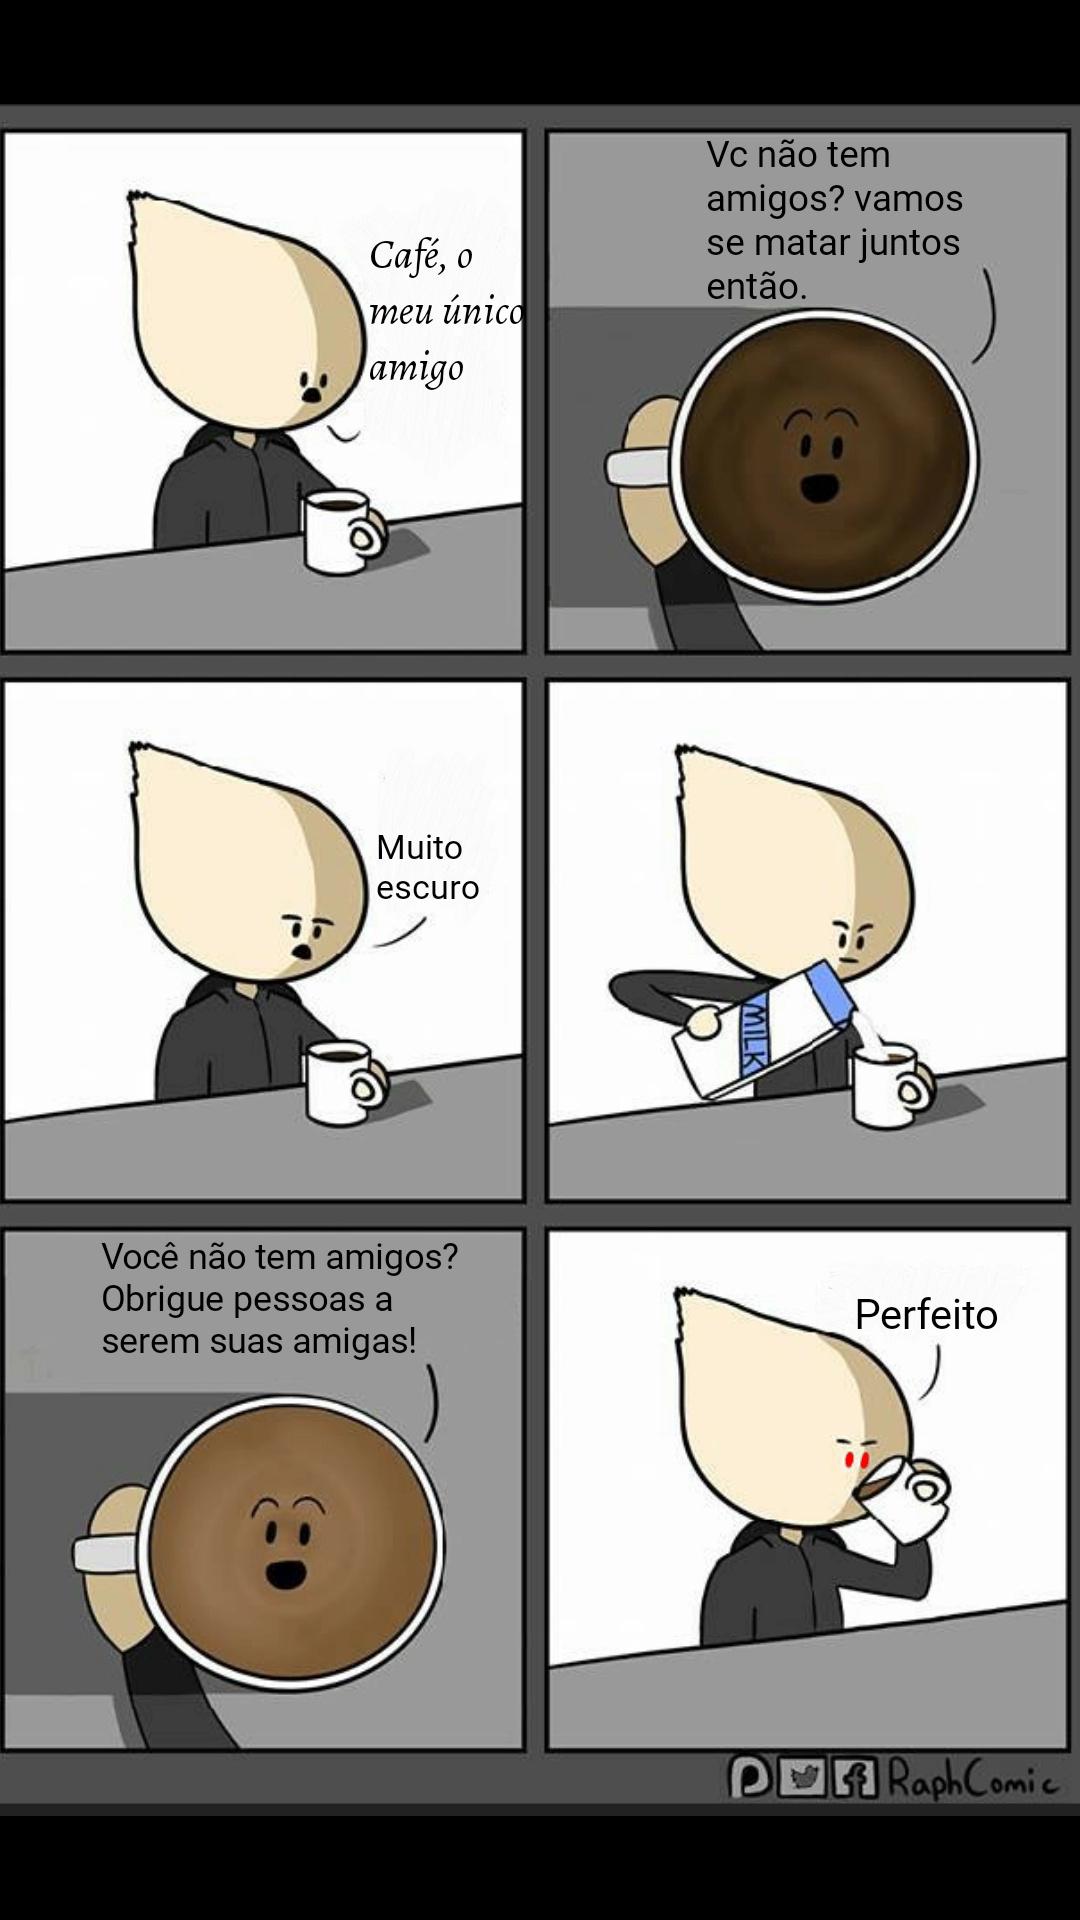 Quero cafeee - meme